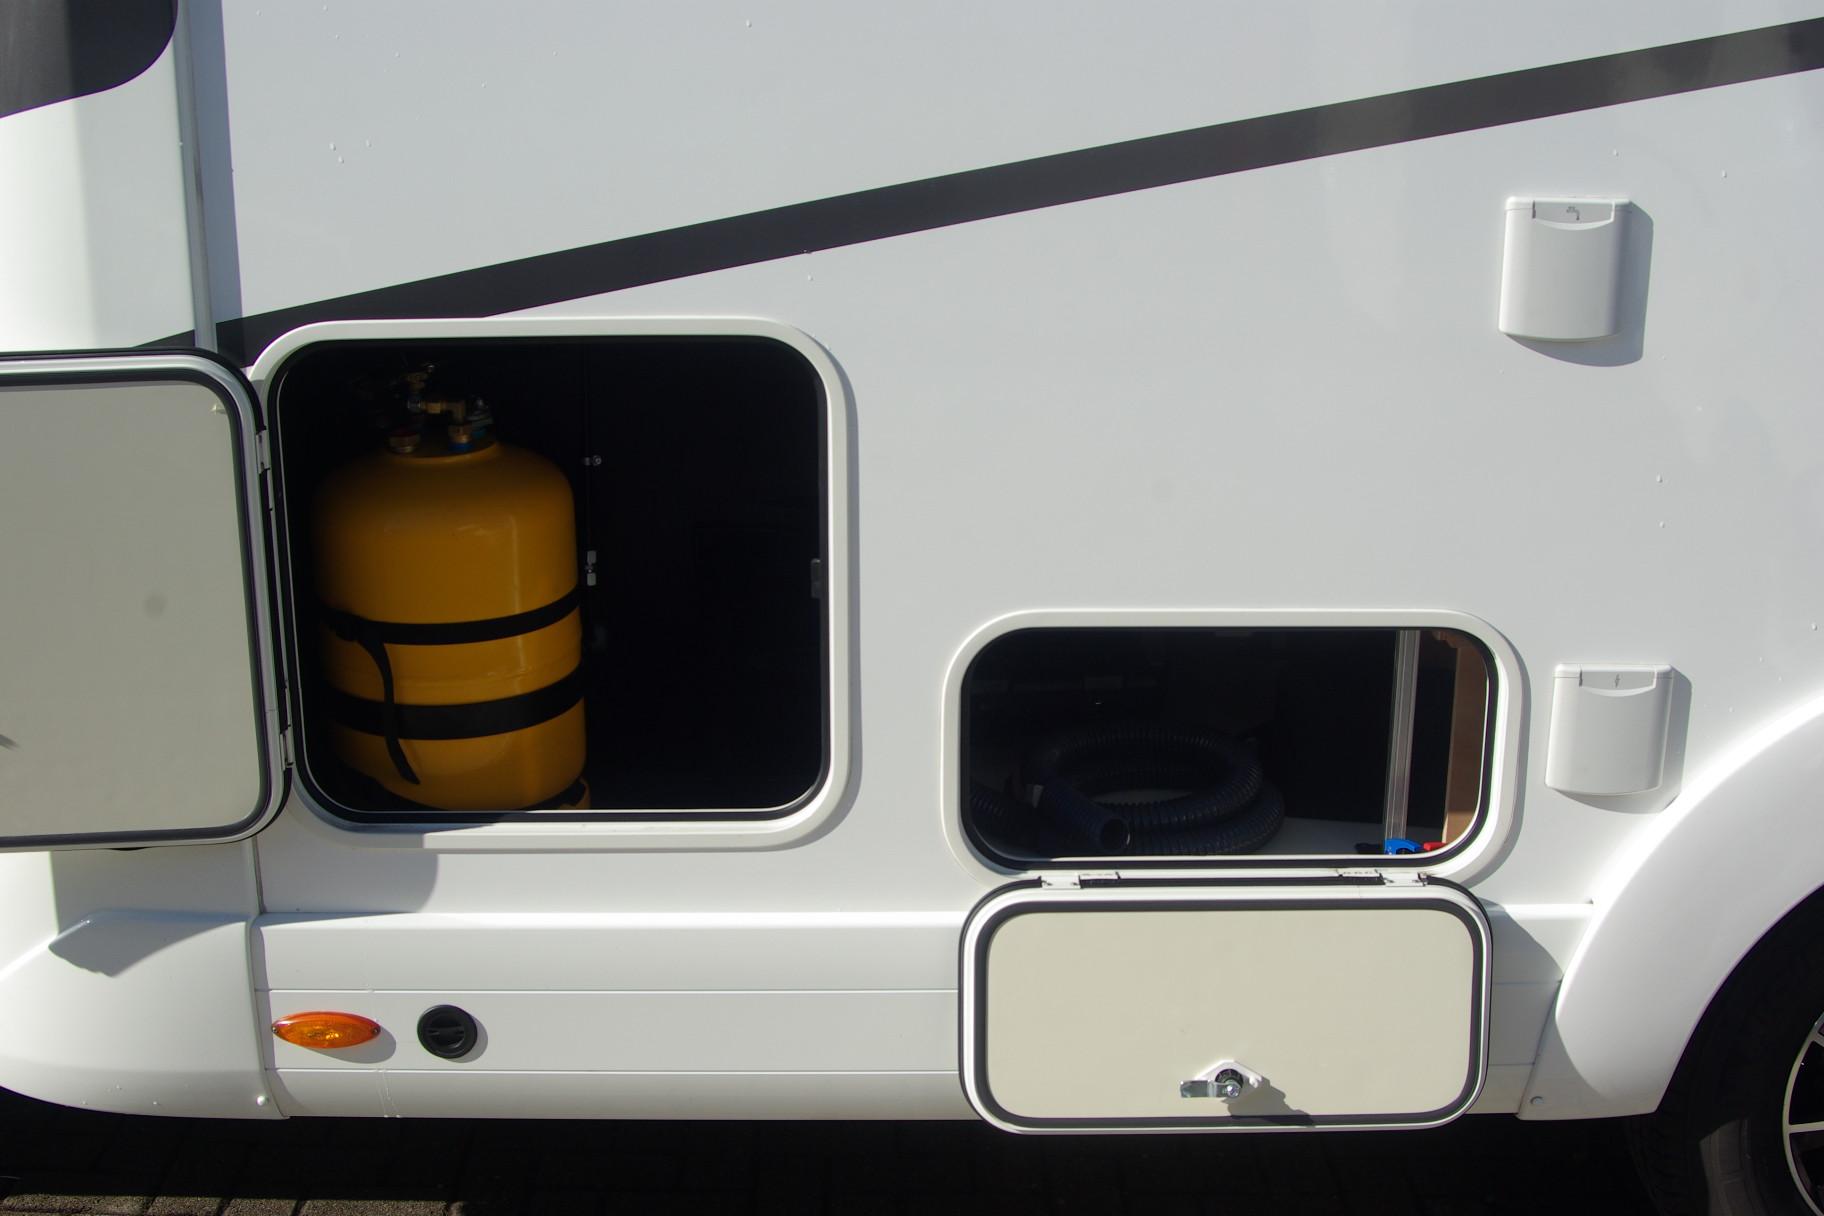 eura mobil cara one 650vb occasion porteur fiat 2 3l 130cv camping car vendre en rhin 67. Black Bedroom Furniture Sets. Home Design Ideas